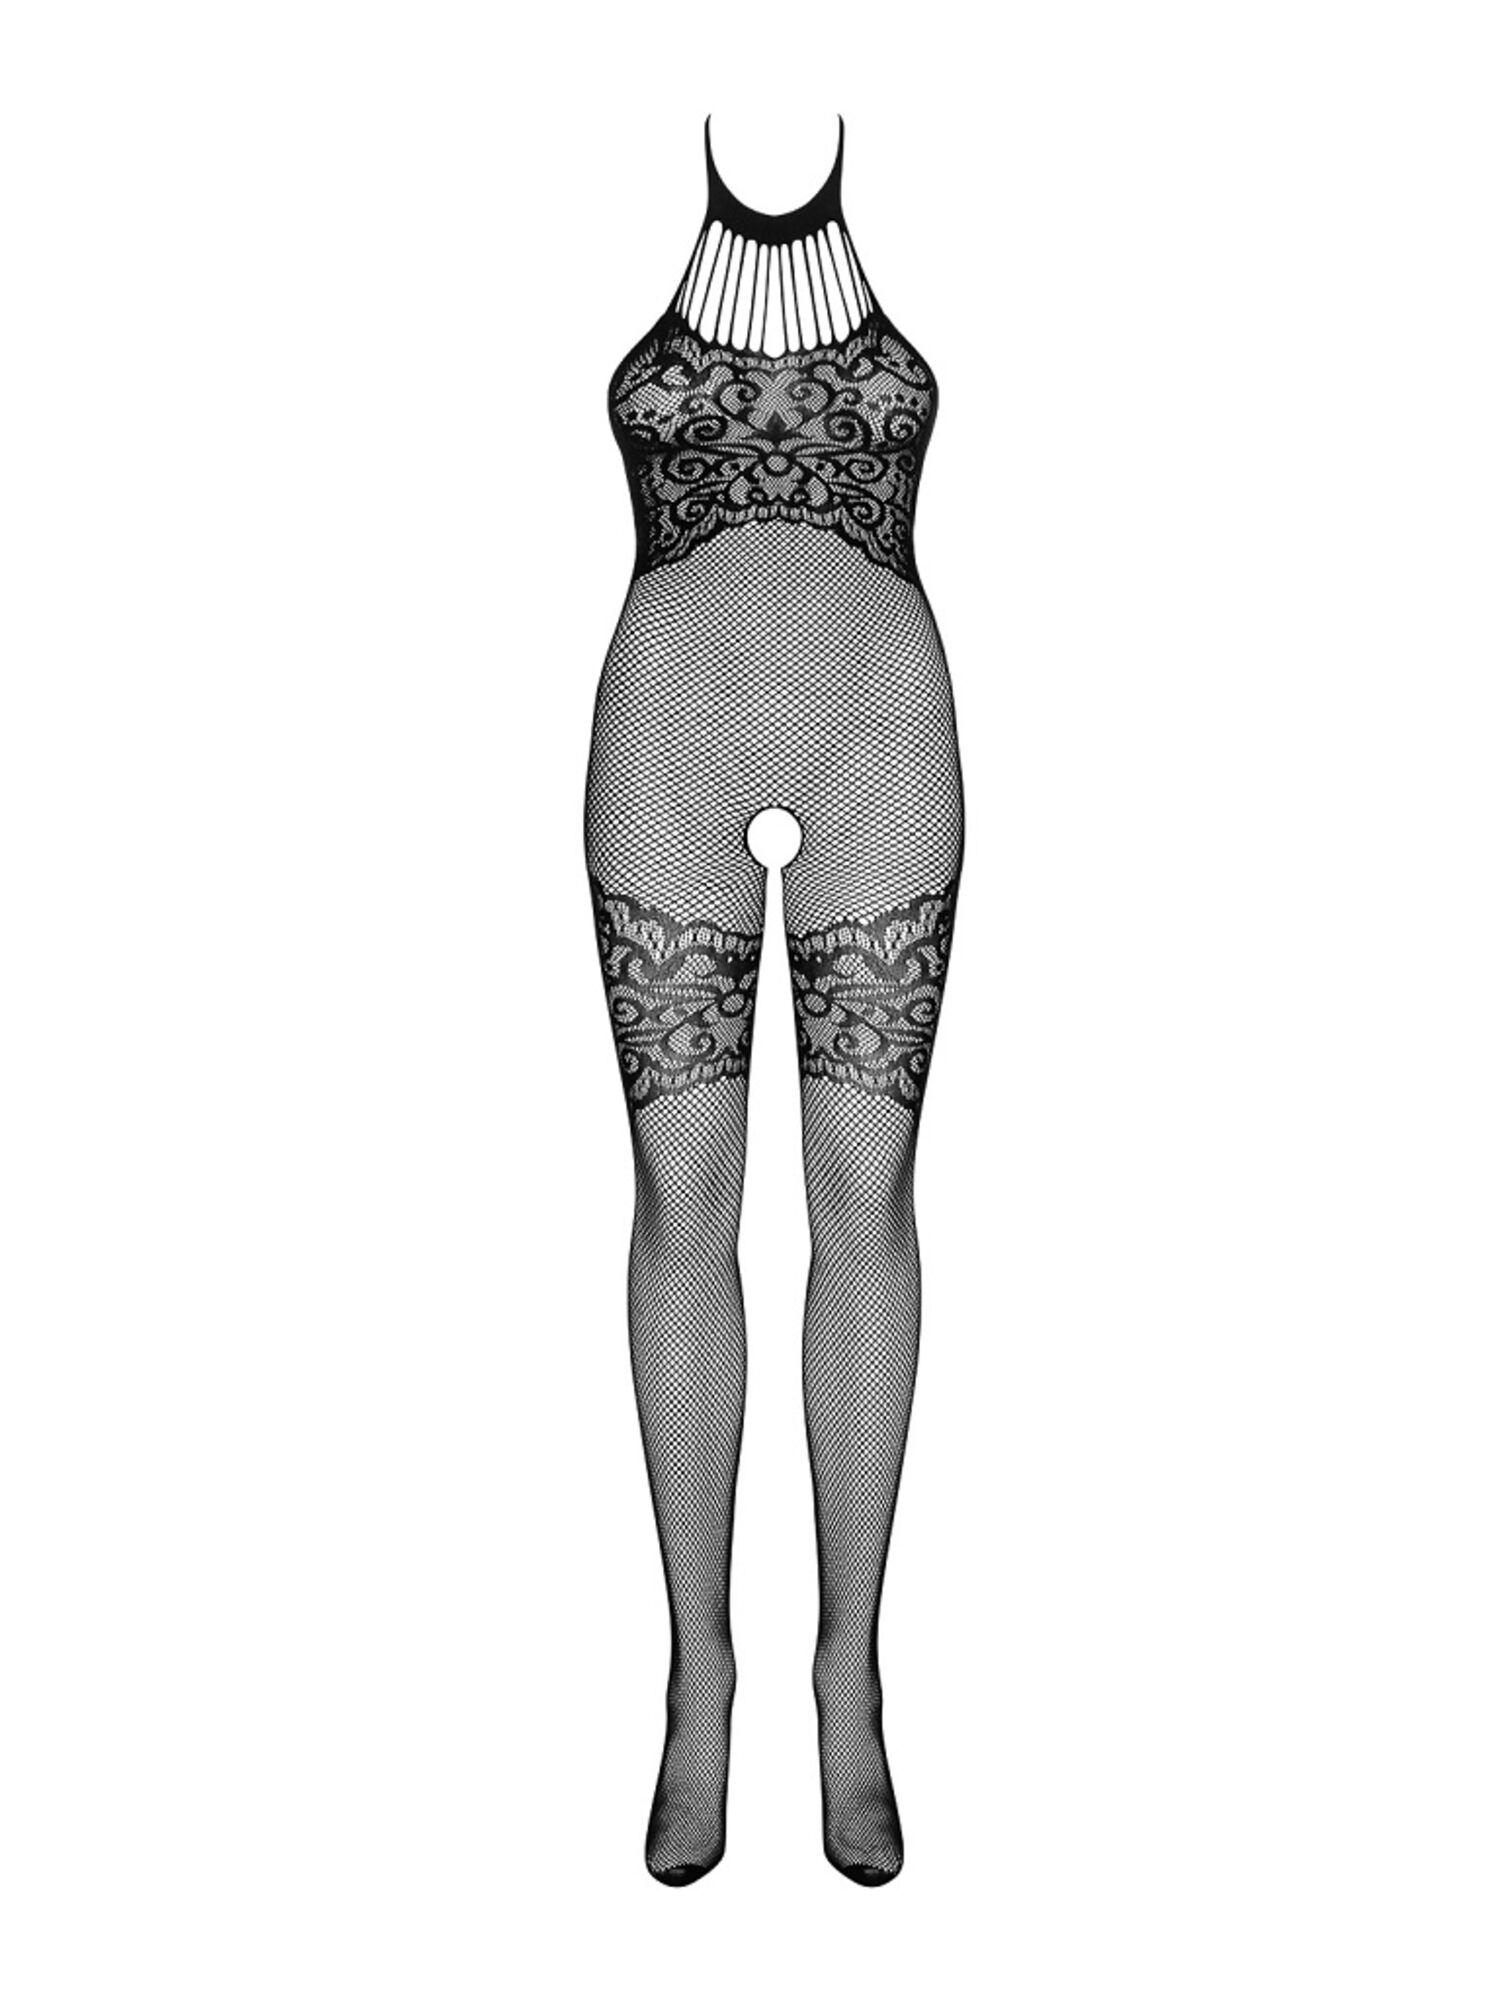 Боди эротическоеG319 BODYSTOCKING черный, OBSESSIVE